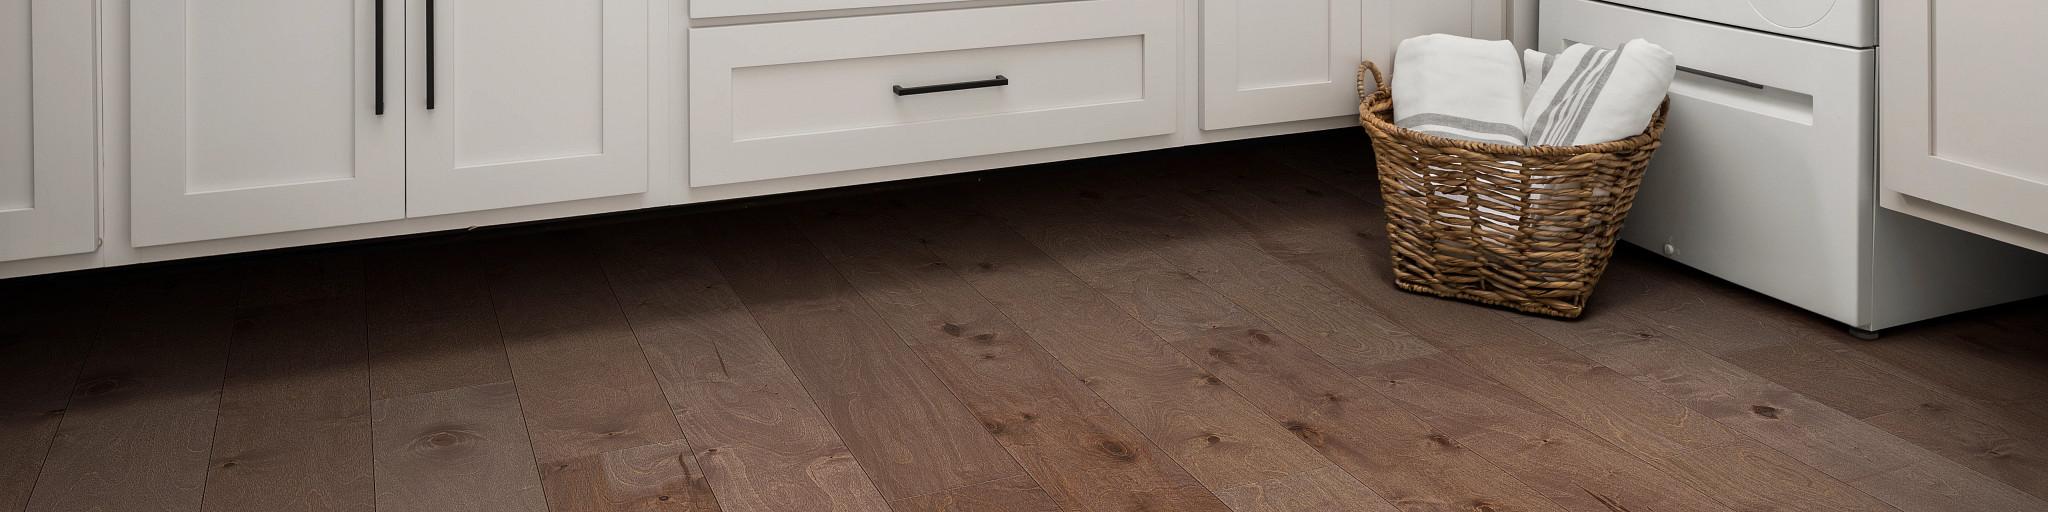 Hardwood-Repel-Engineered-Celestial-SW744-07095-Amber-Laundry-Room-2021